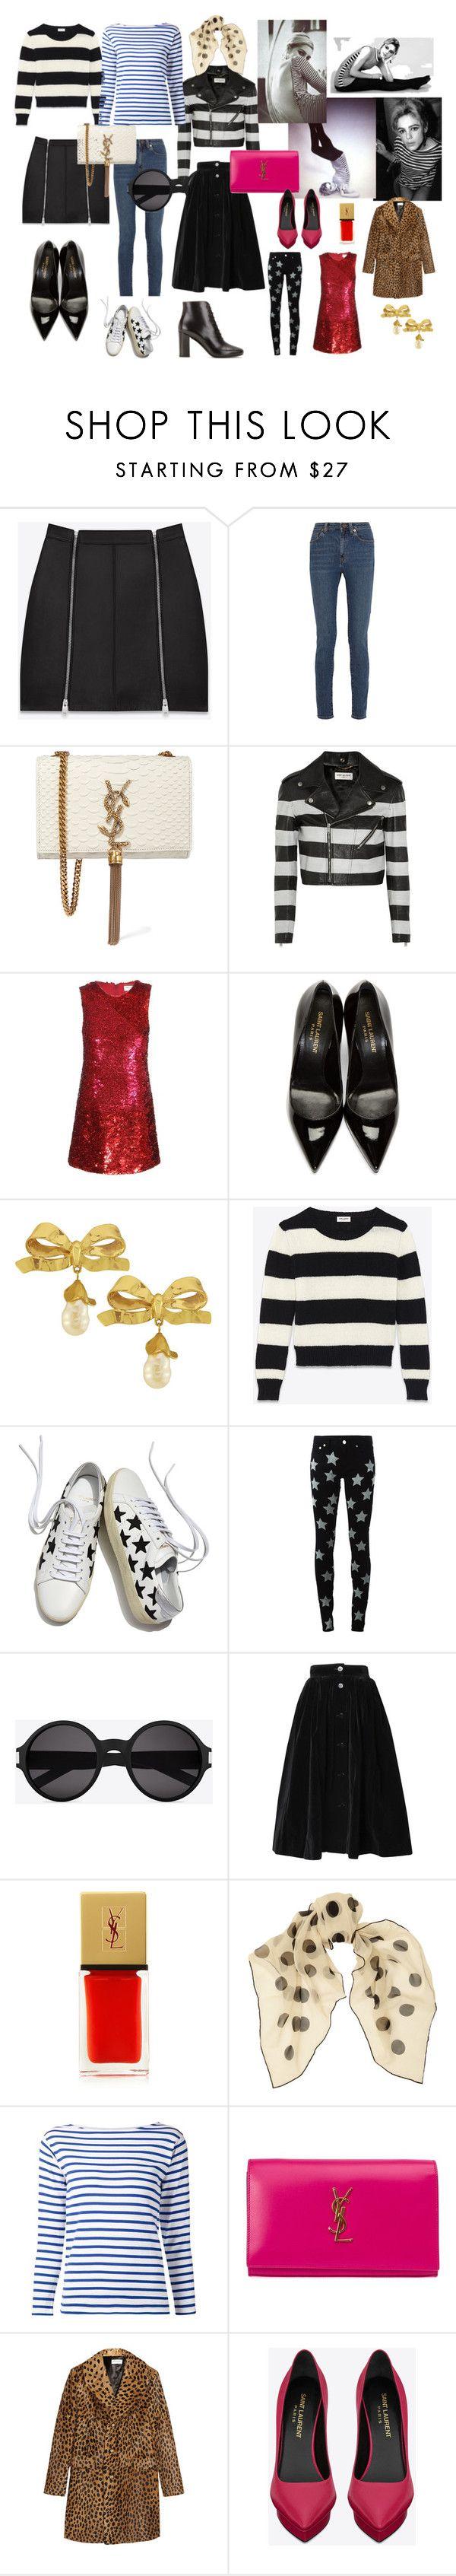 Saint Laurent - Edie Sedgwick by jenny-ragnwaldh on Polyvore featuring Yves Saint Laurent, Vintage, Sedgwick, women's clothing, women's fashion, women, female, woman, misses and juniors